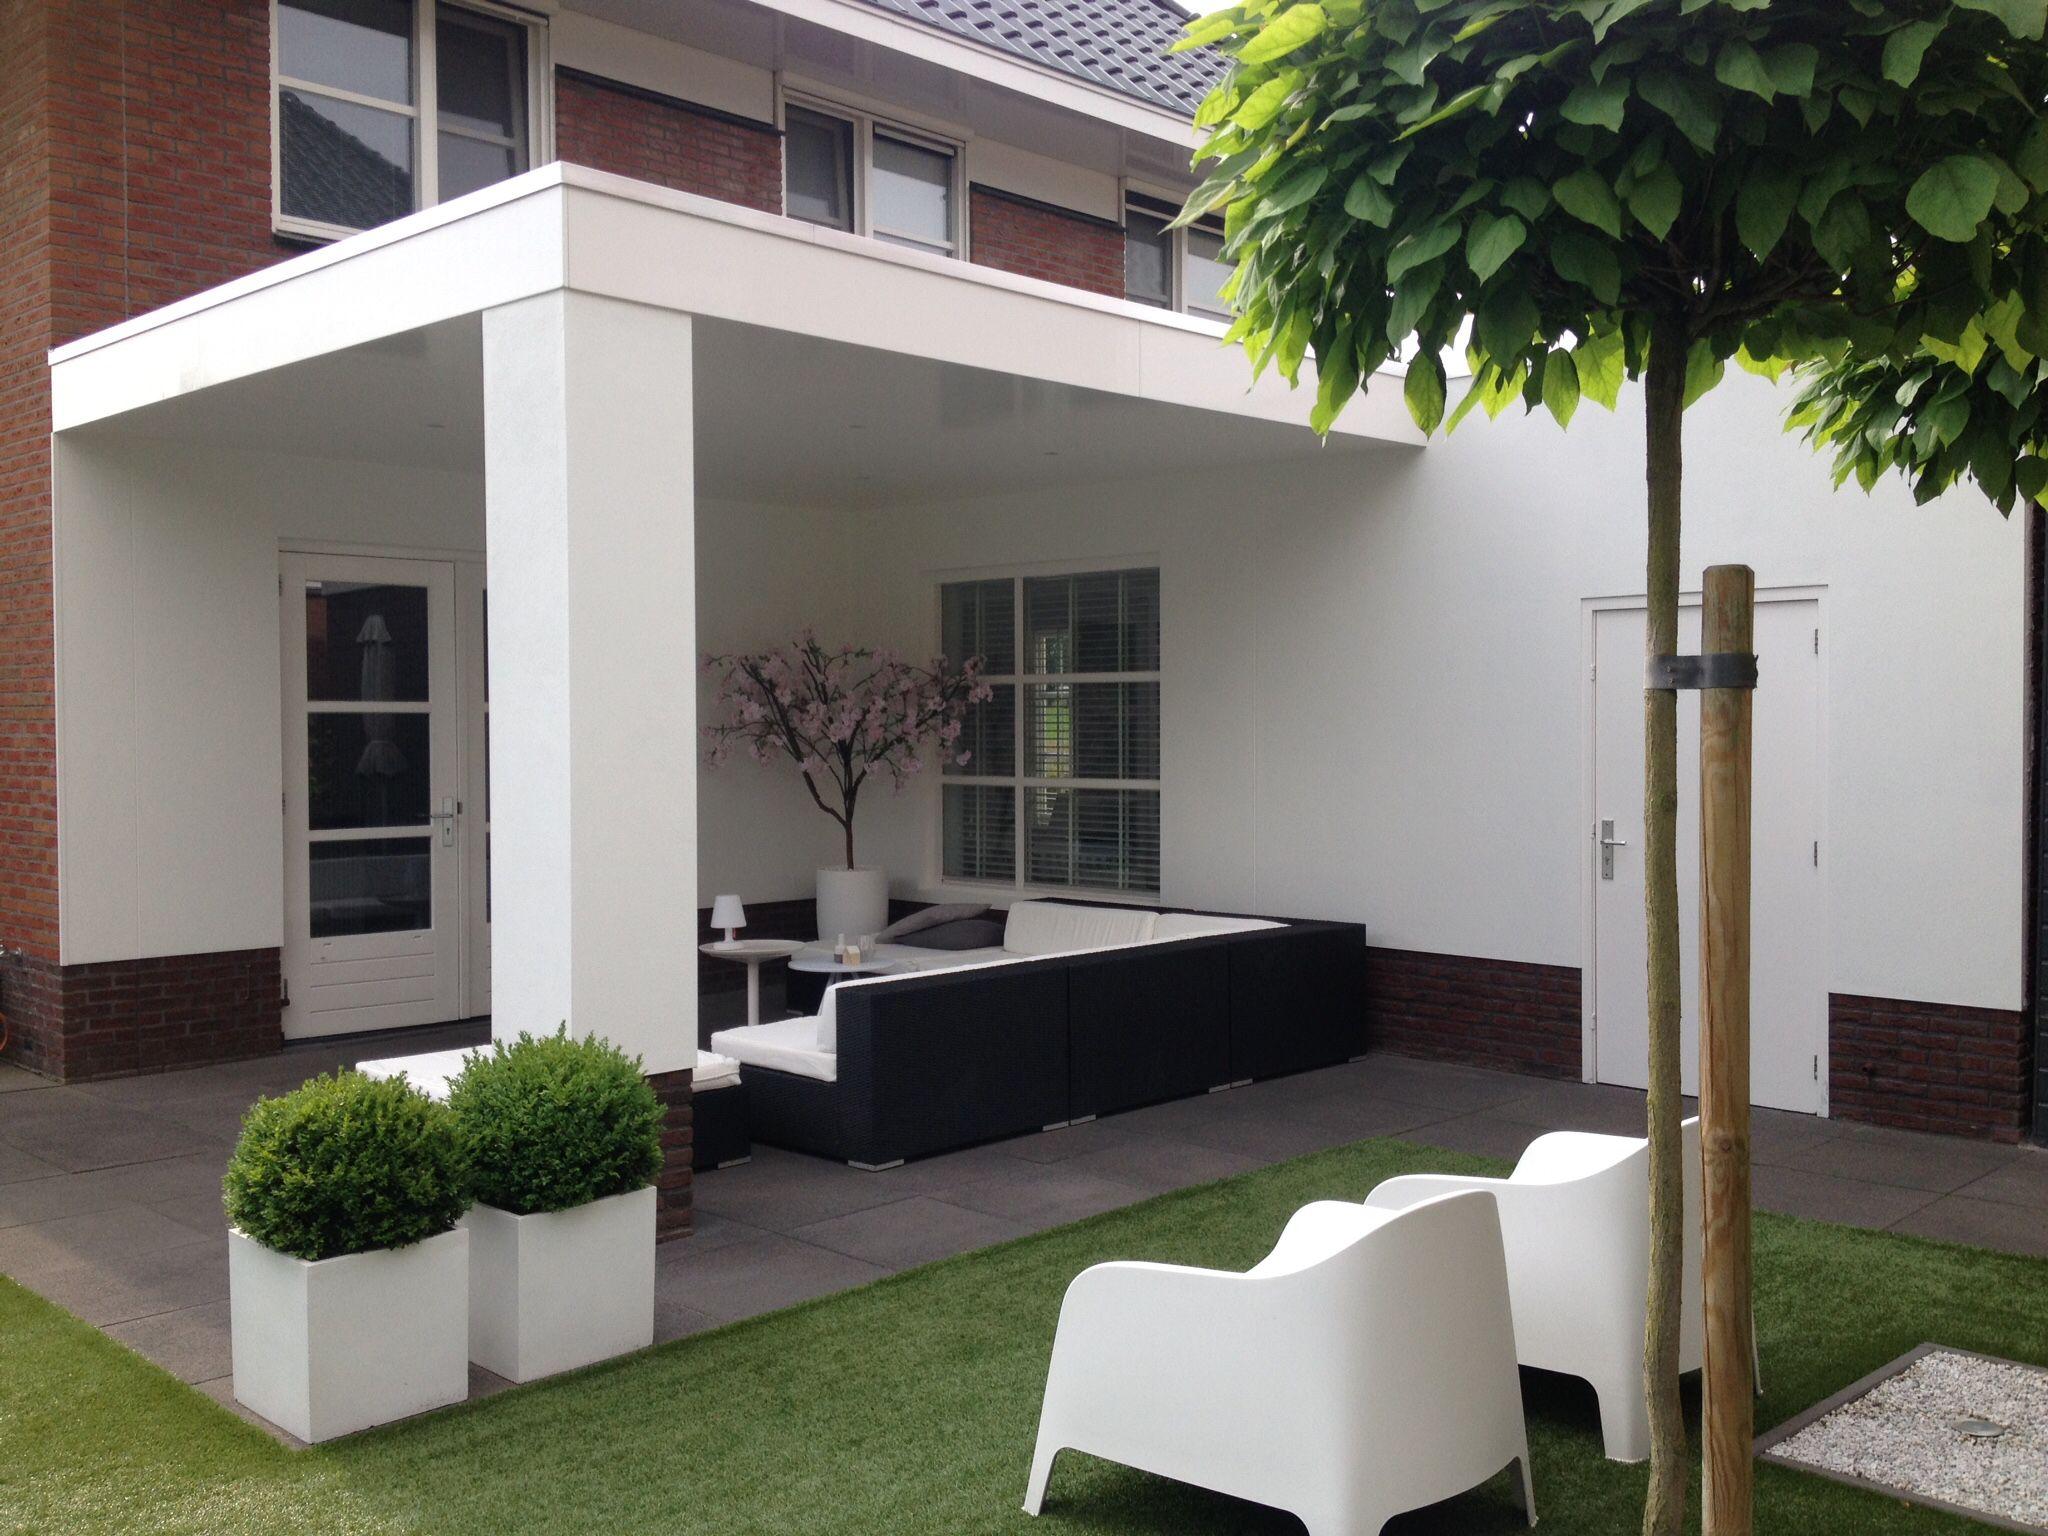 Overkapping aan huis tuin pinterest veranda 39 s - Veranda modern huis ...